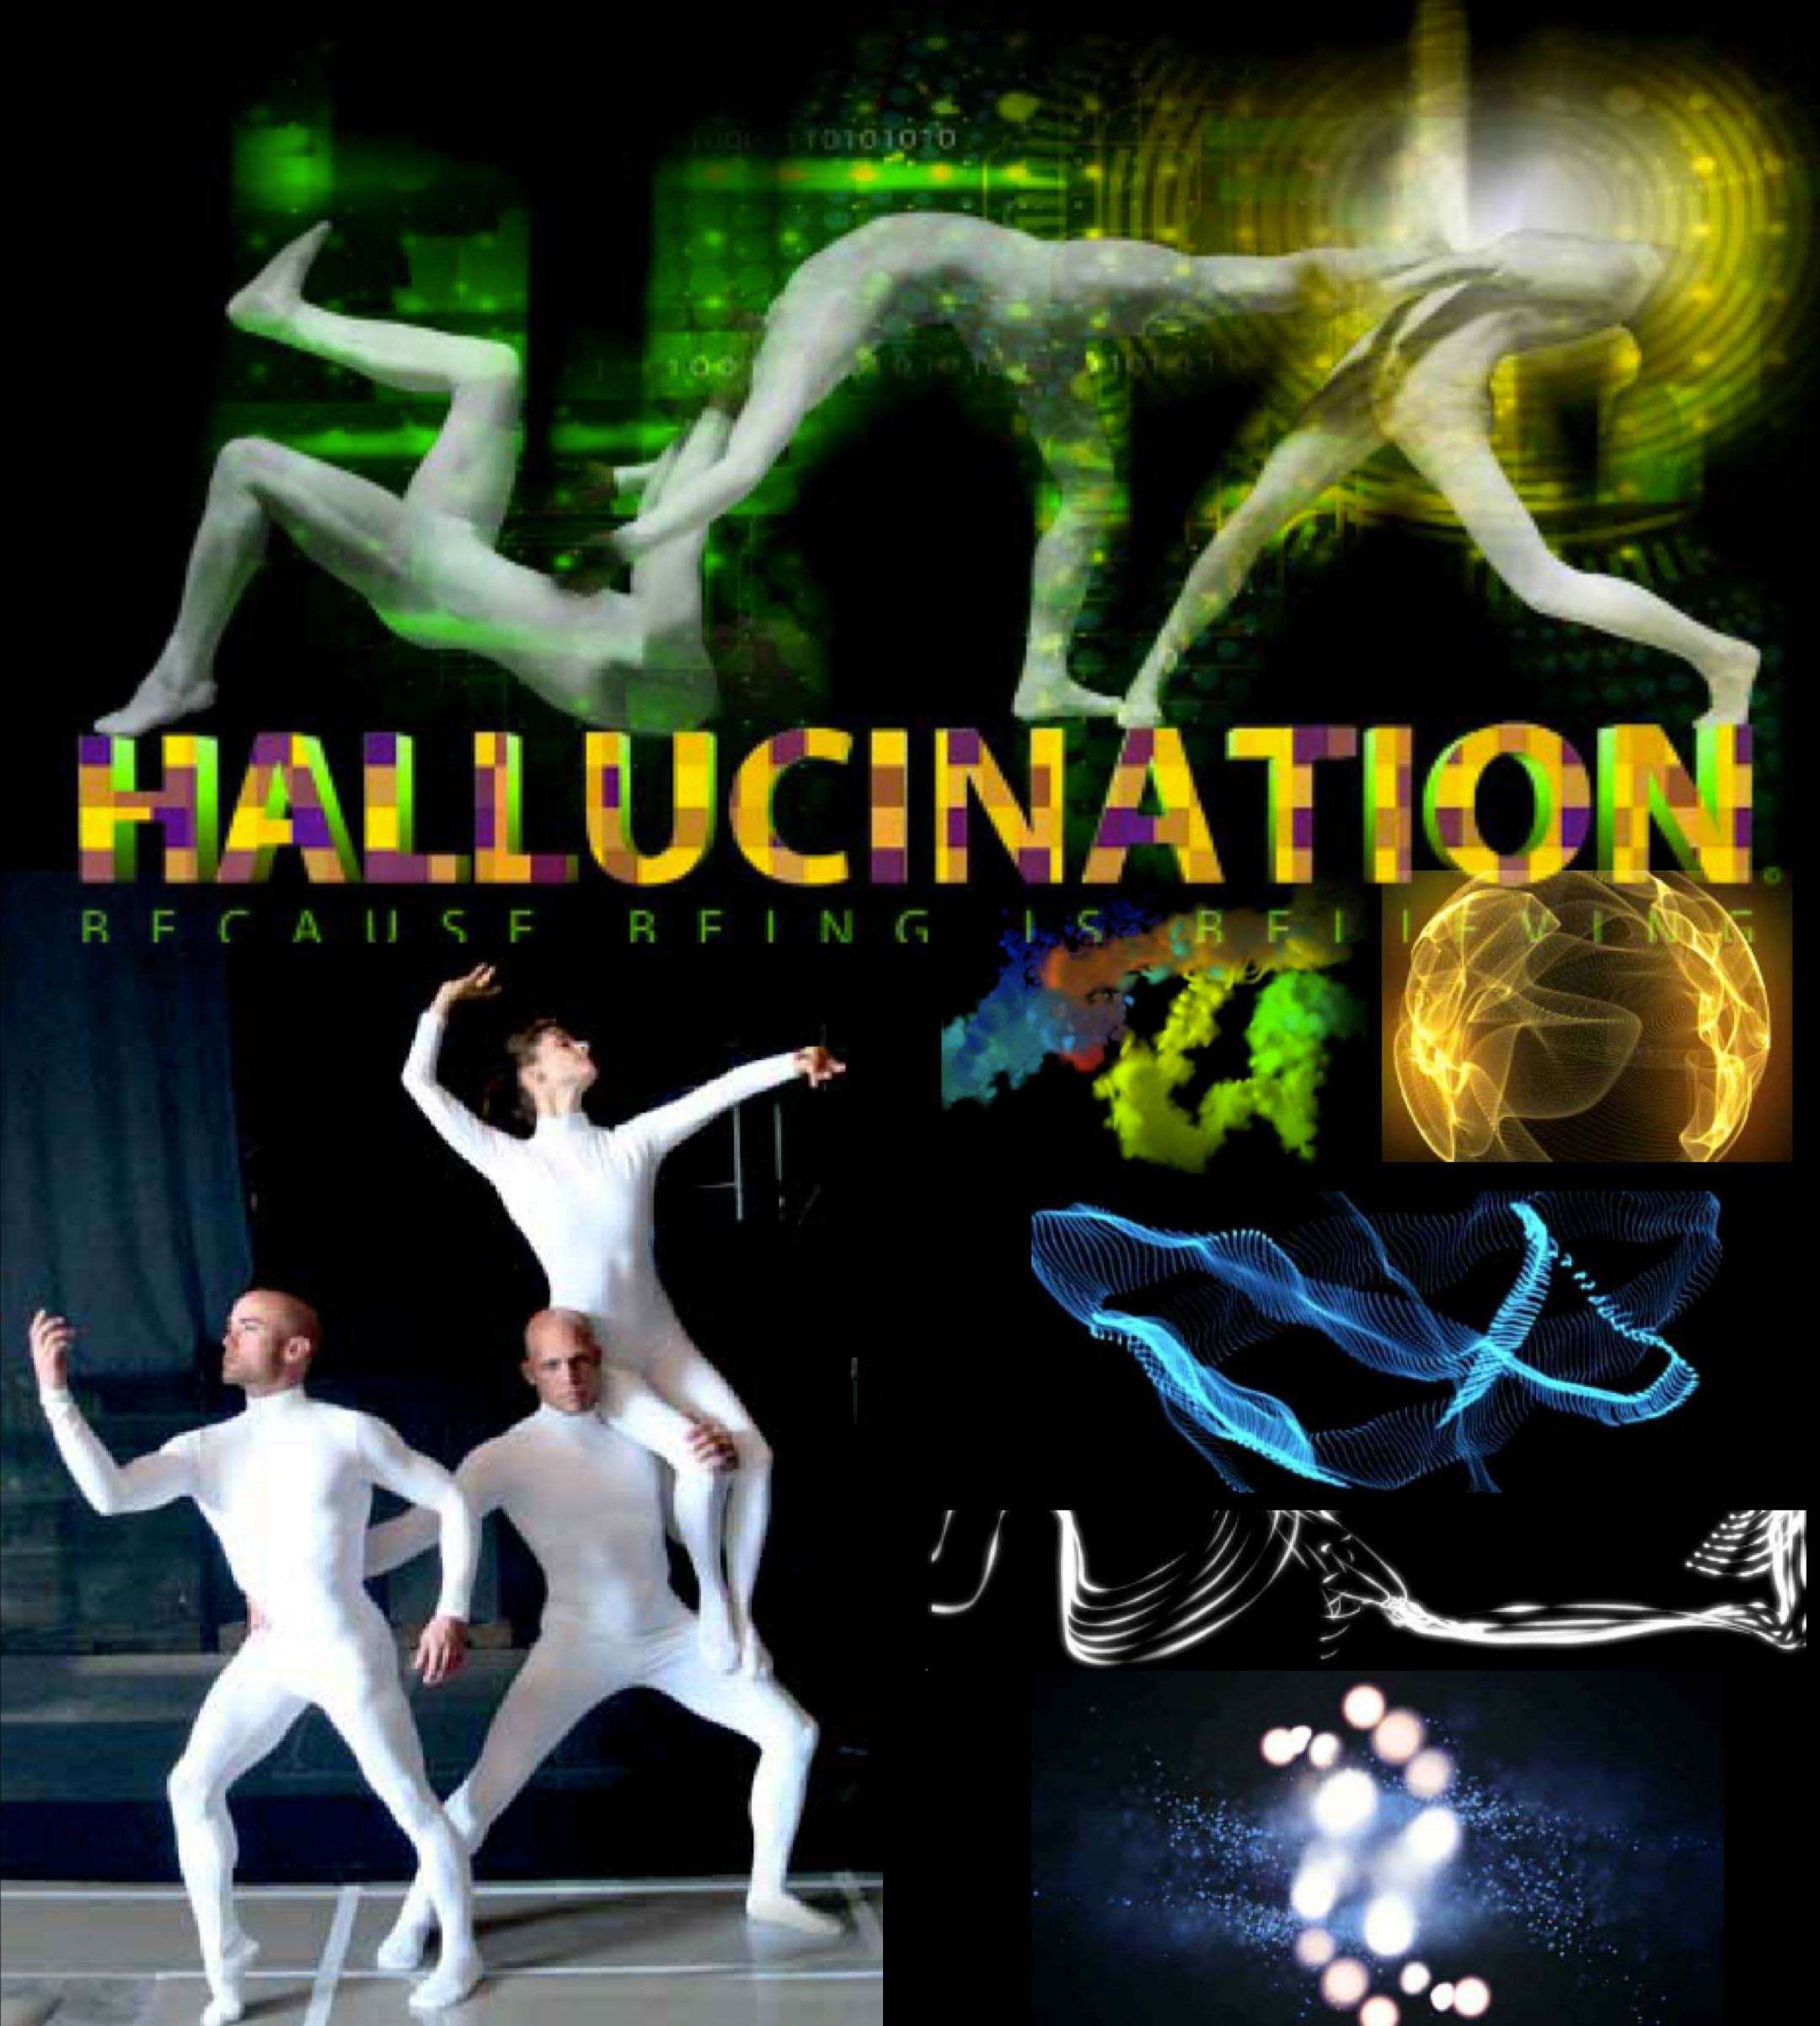 Hallucination – Revival Casino Video Show – Theme &  Brand